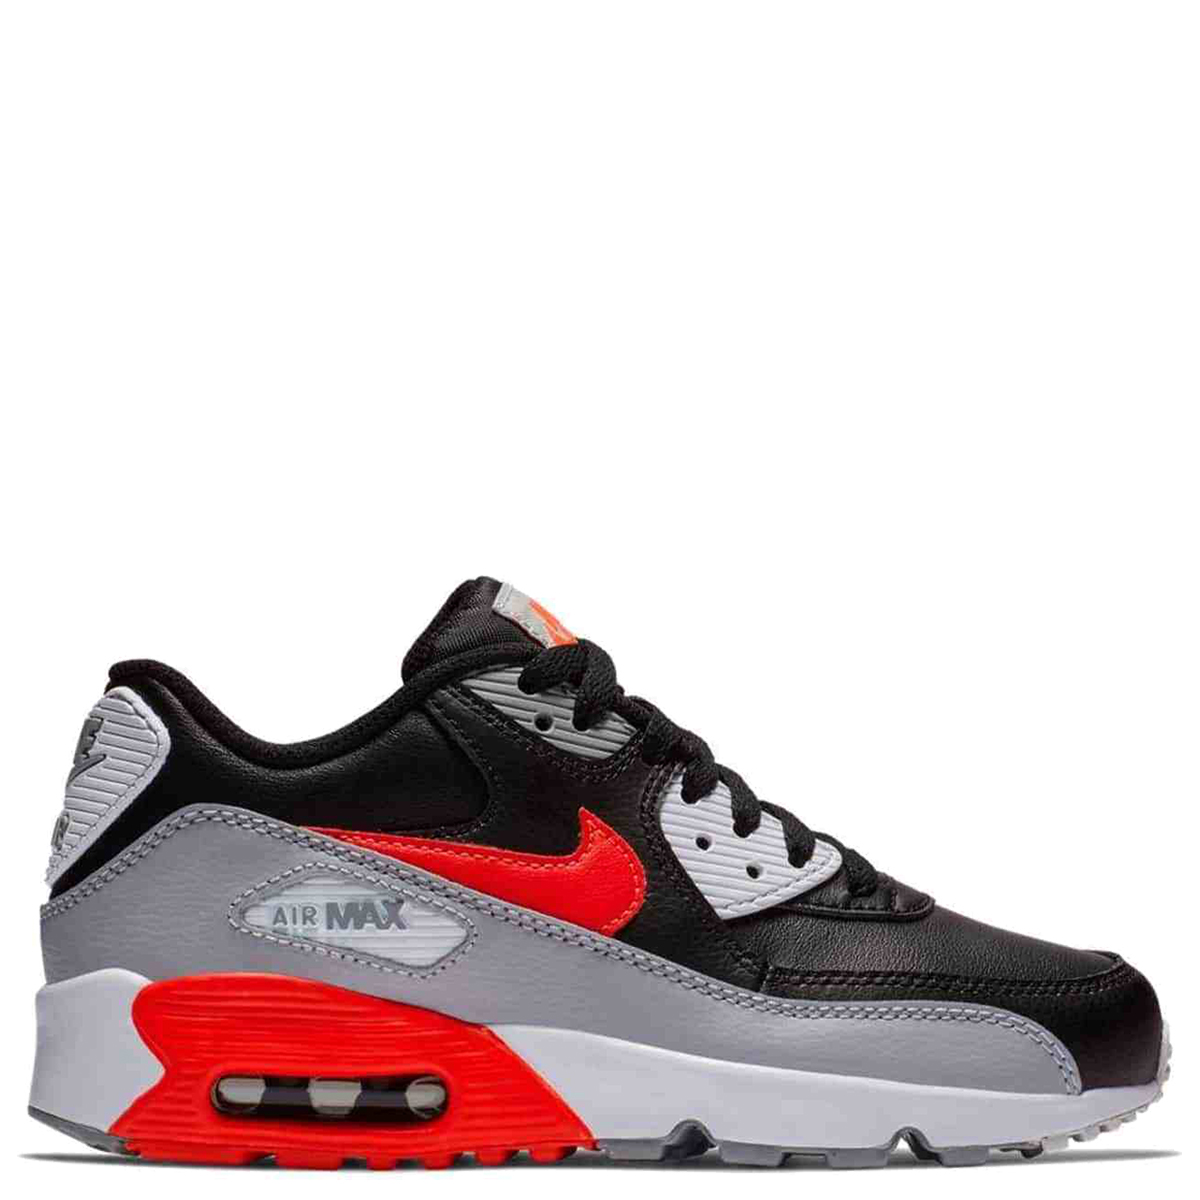 Nike Air Max 90 Leather (GS) Sneakers BlackBlack